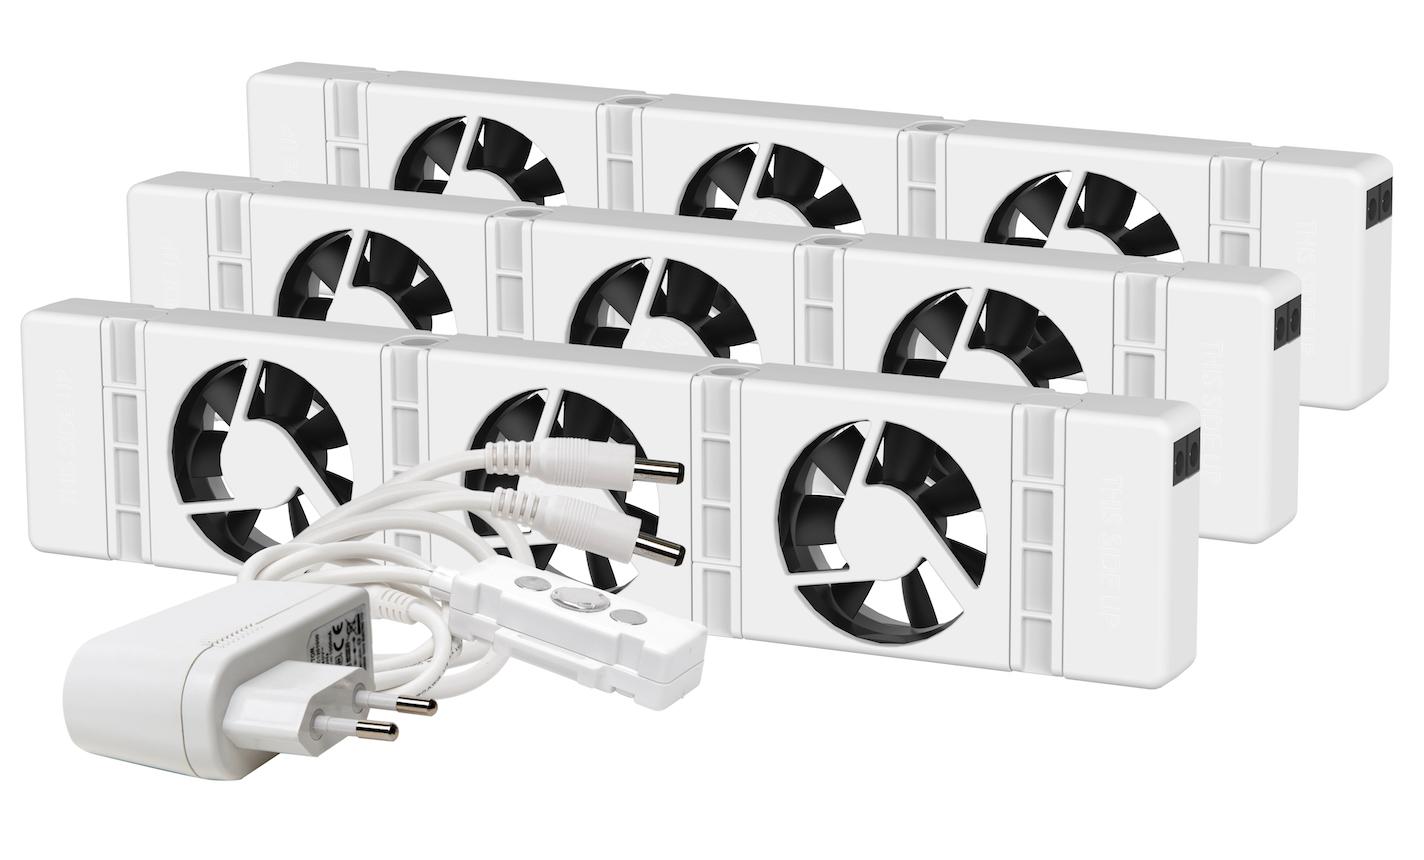 Speedcomfort Slimme radiatorventilator triple pack 2021